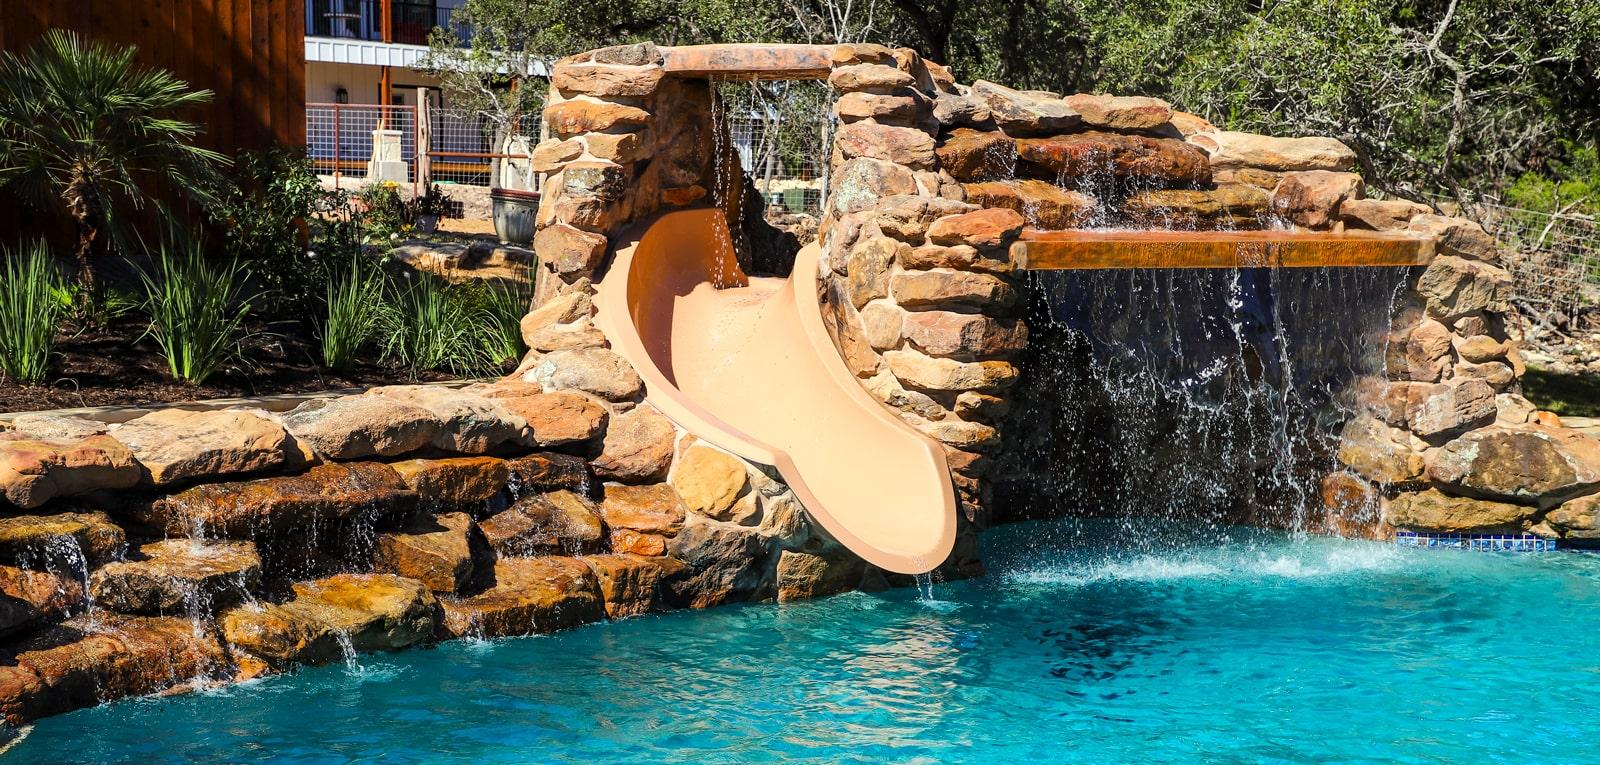 inground pool with rock waterfall slide